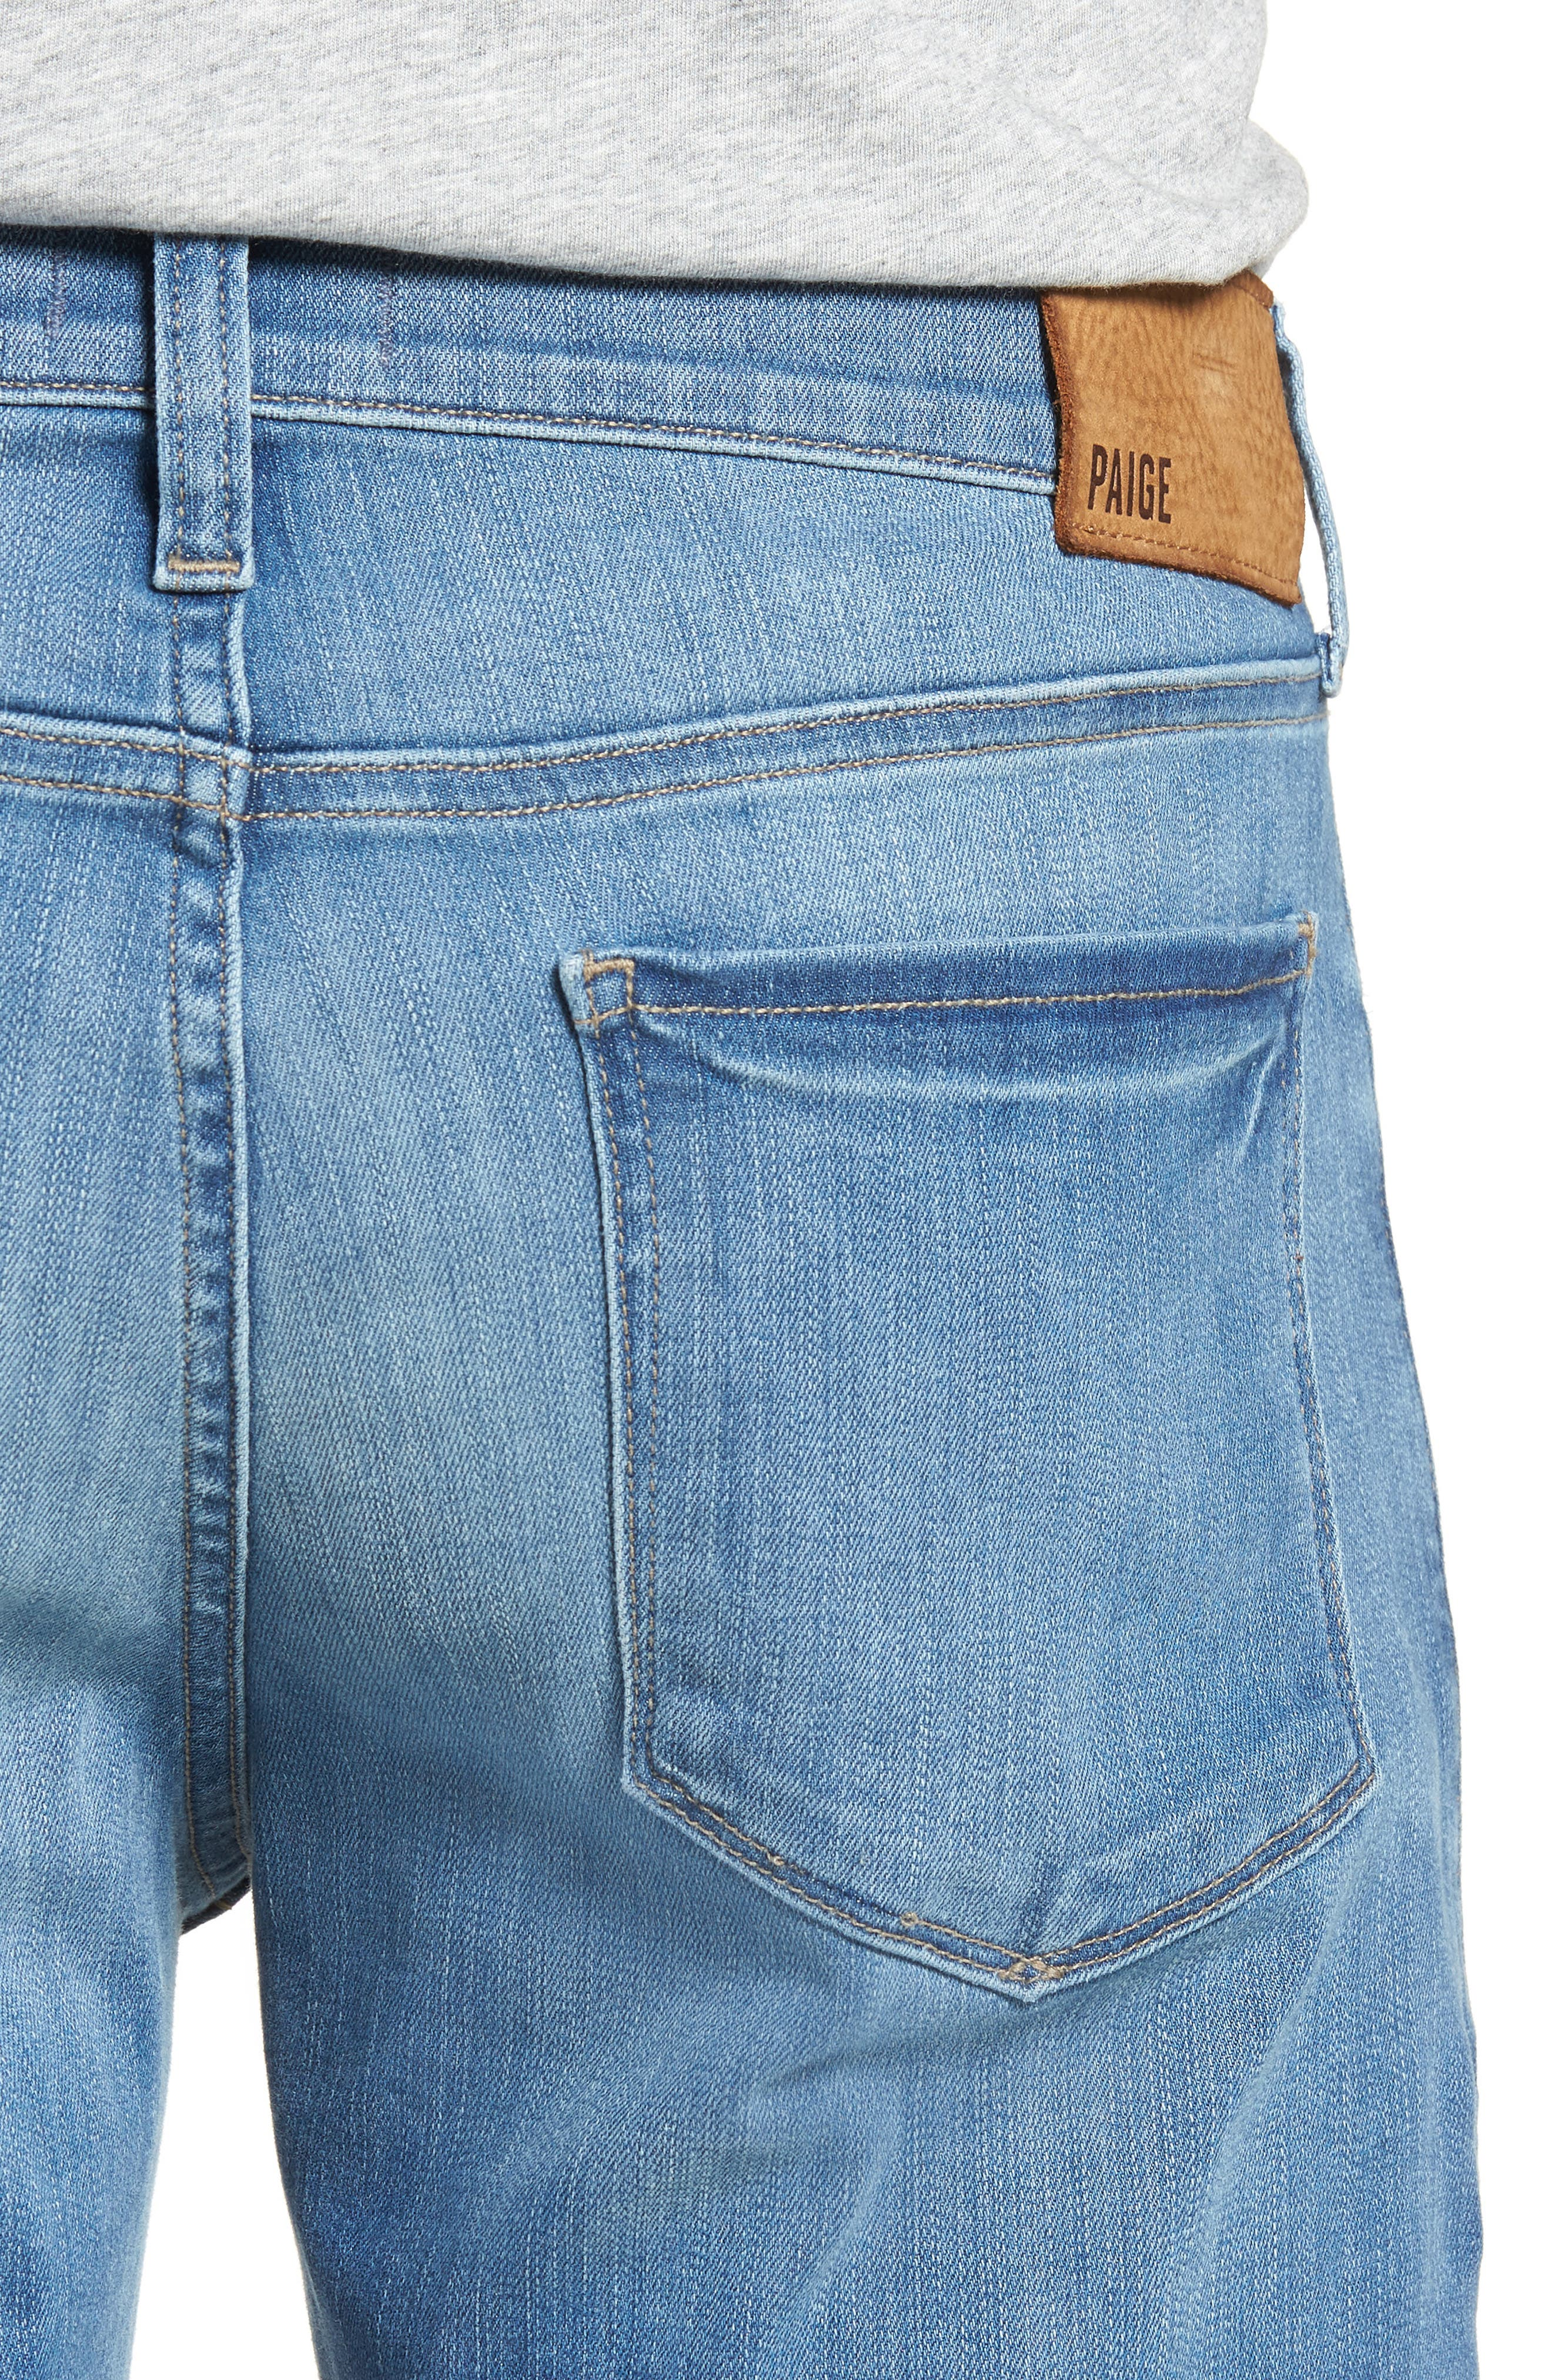 Transcend - Federal Slim Straight Leg Jeans,                             Alternate thumbnail 4, color,                             Hammonds